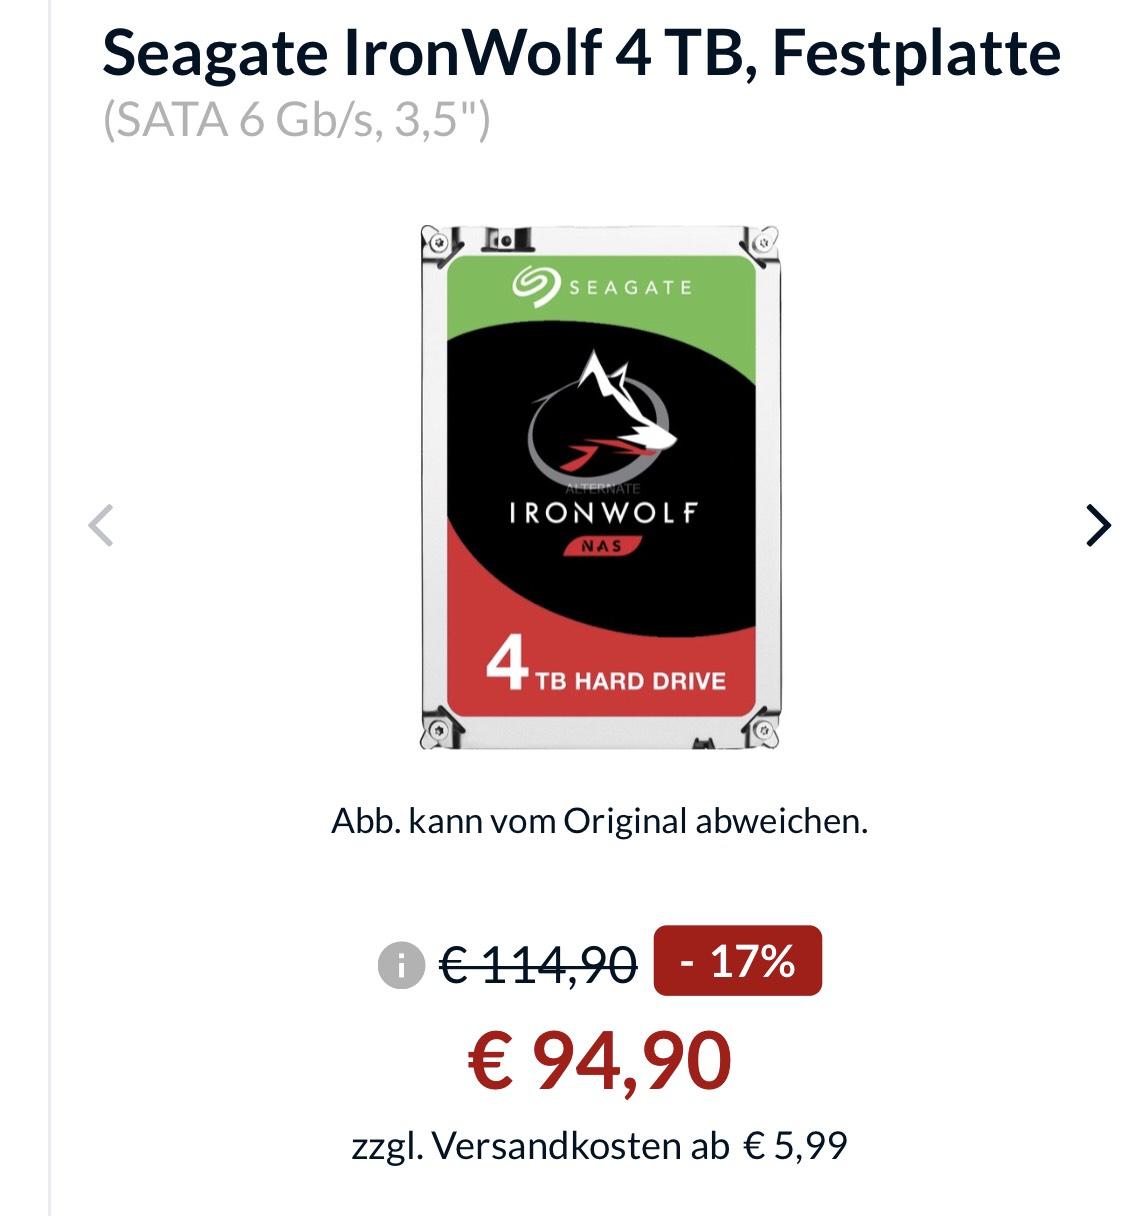 Seagate Iron Wolf 4Tb Festplatte